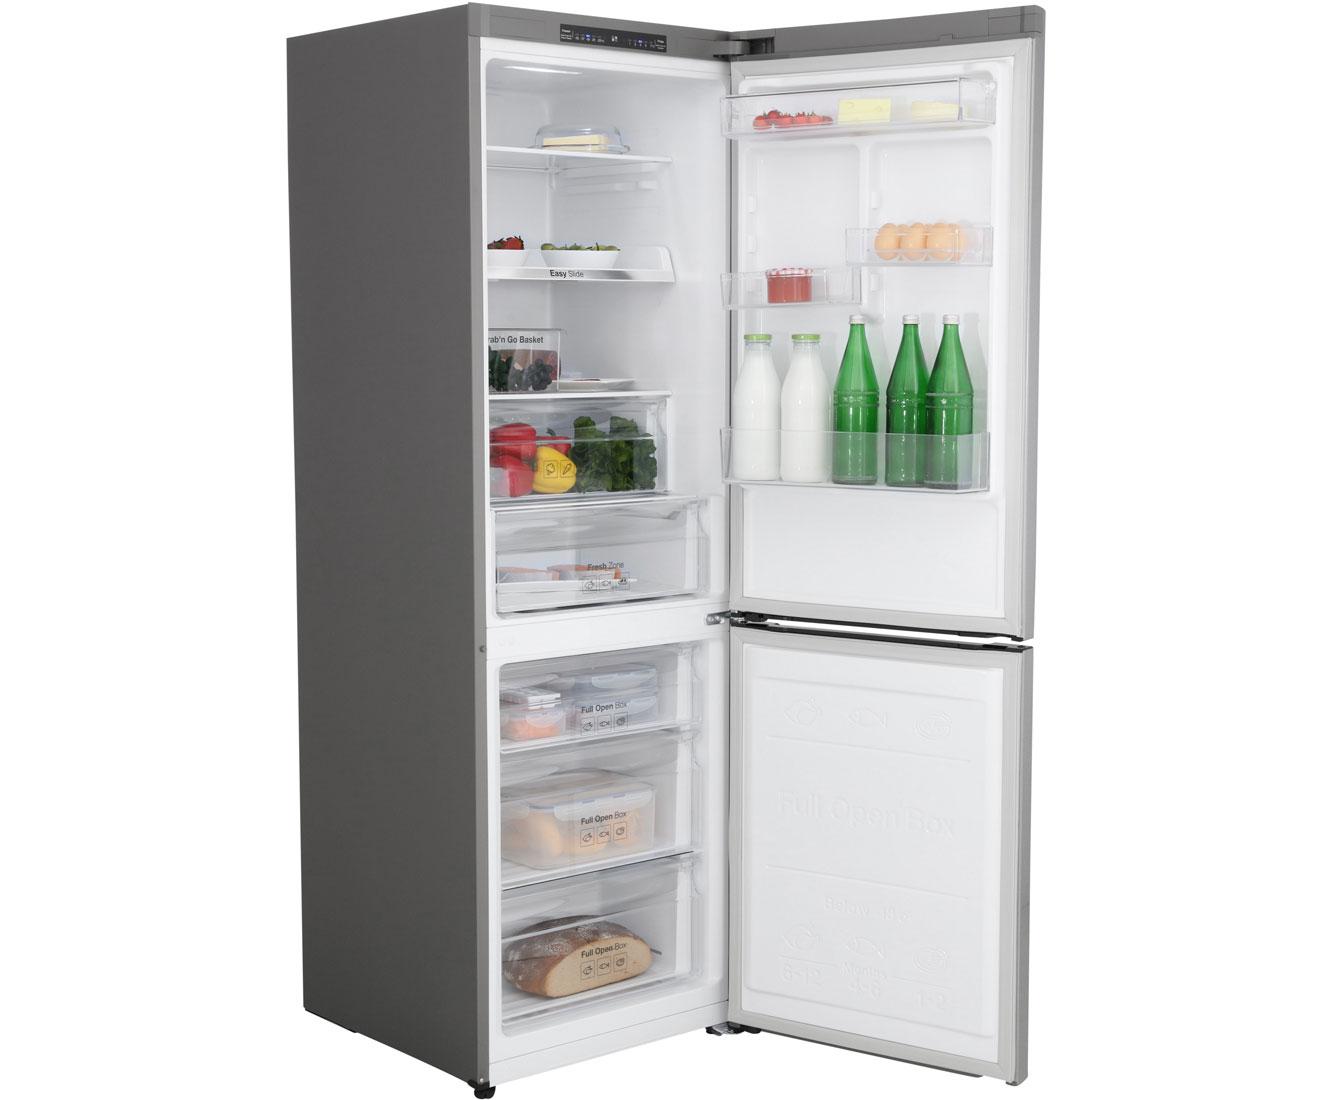 Kühlschrank Kombi : No frost kühlschrank samsung kühl gefrierkombination rl j sa eg